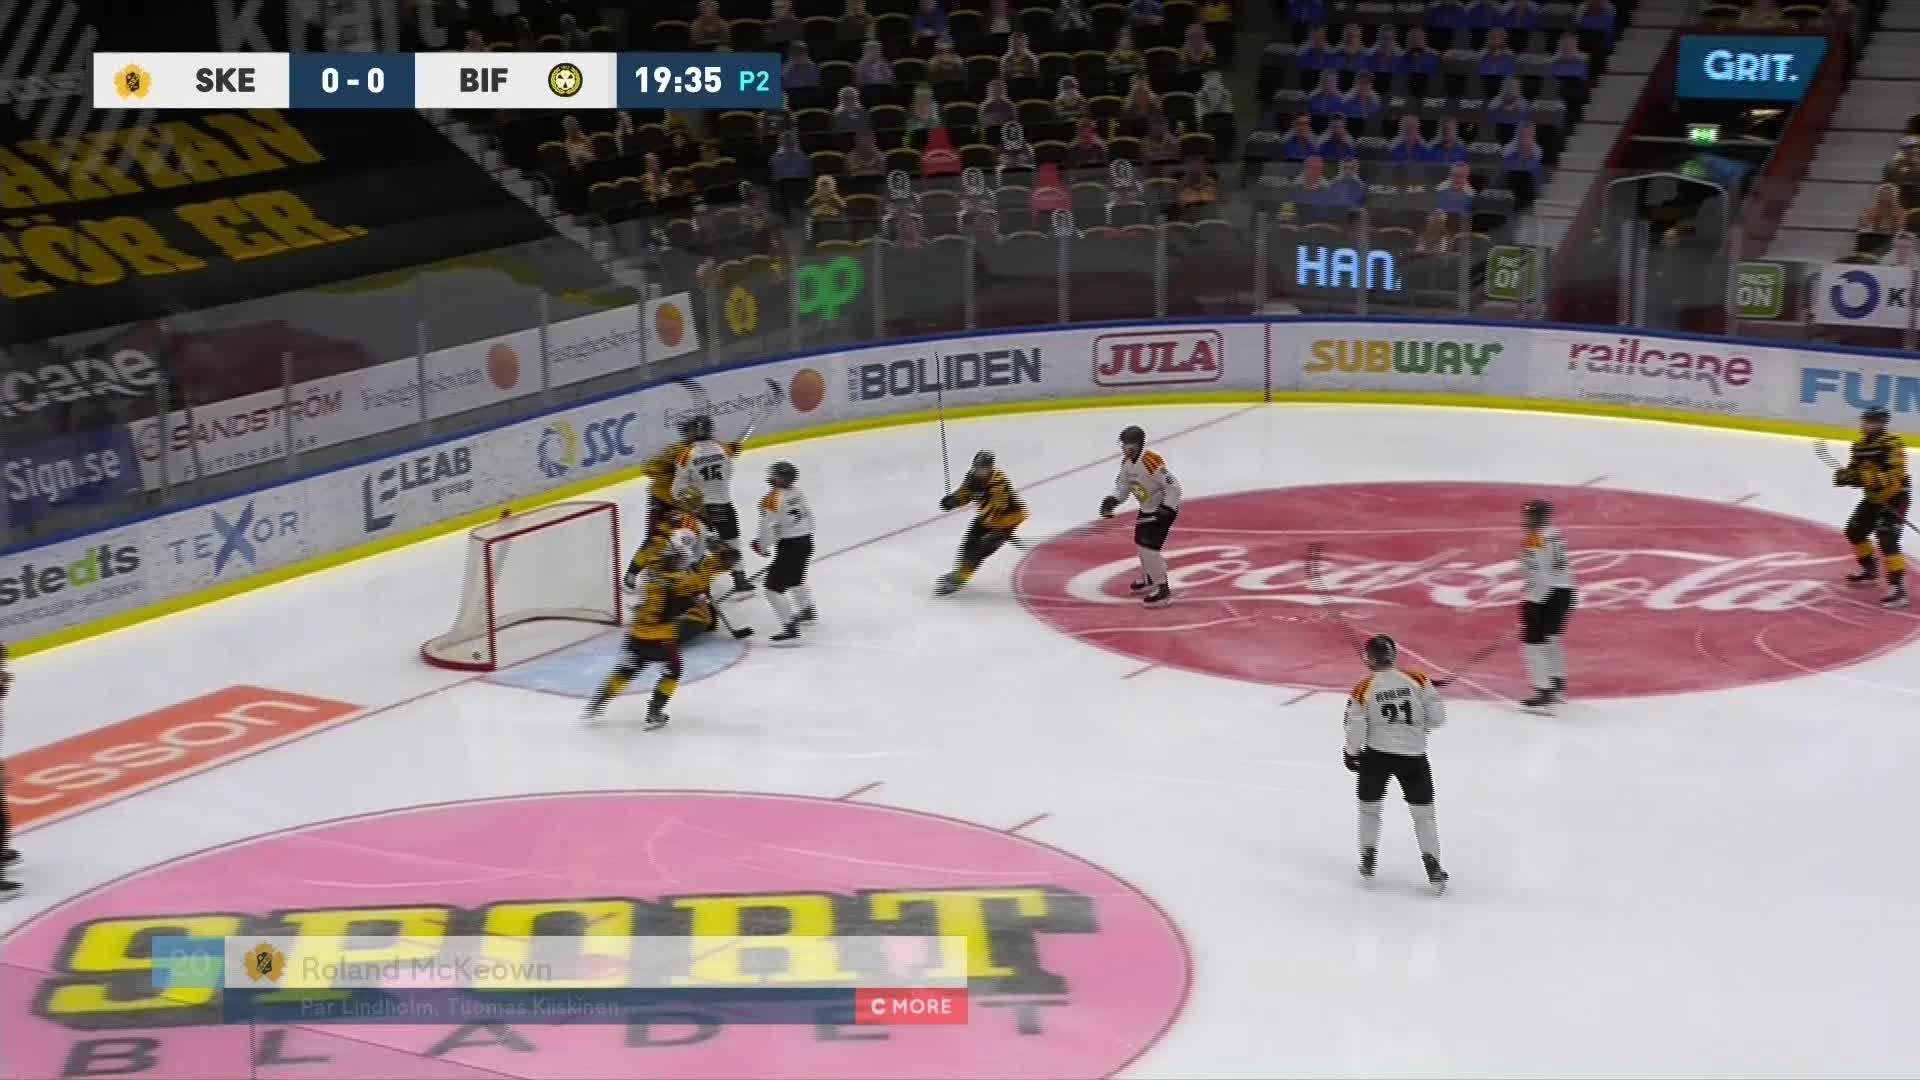 Skellefteå AIK - Brynäs IF 1-0